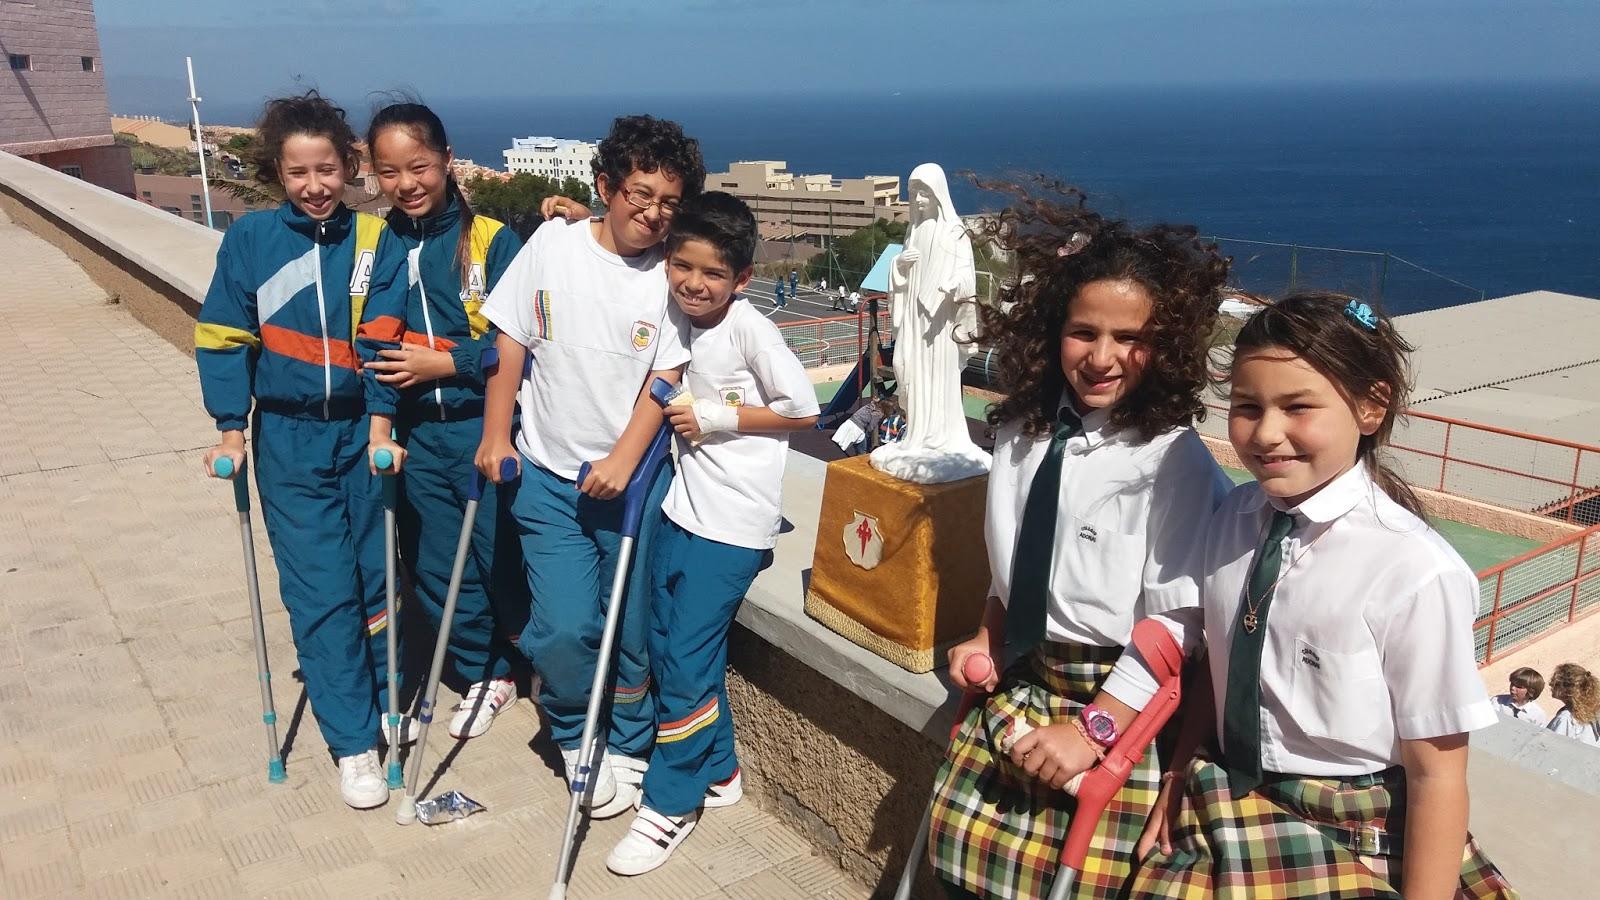 Gospa peregrina reina de la paz visita colegio adonai - Colegio aparejadores tenerife ...